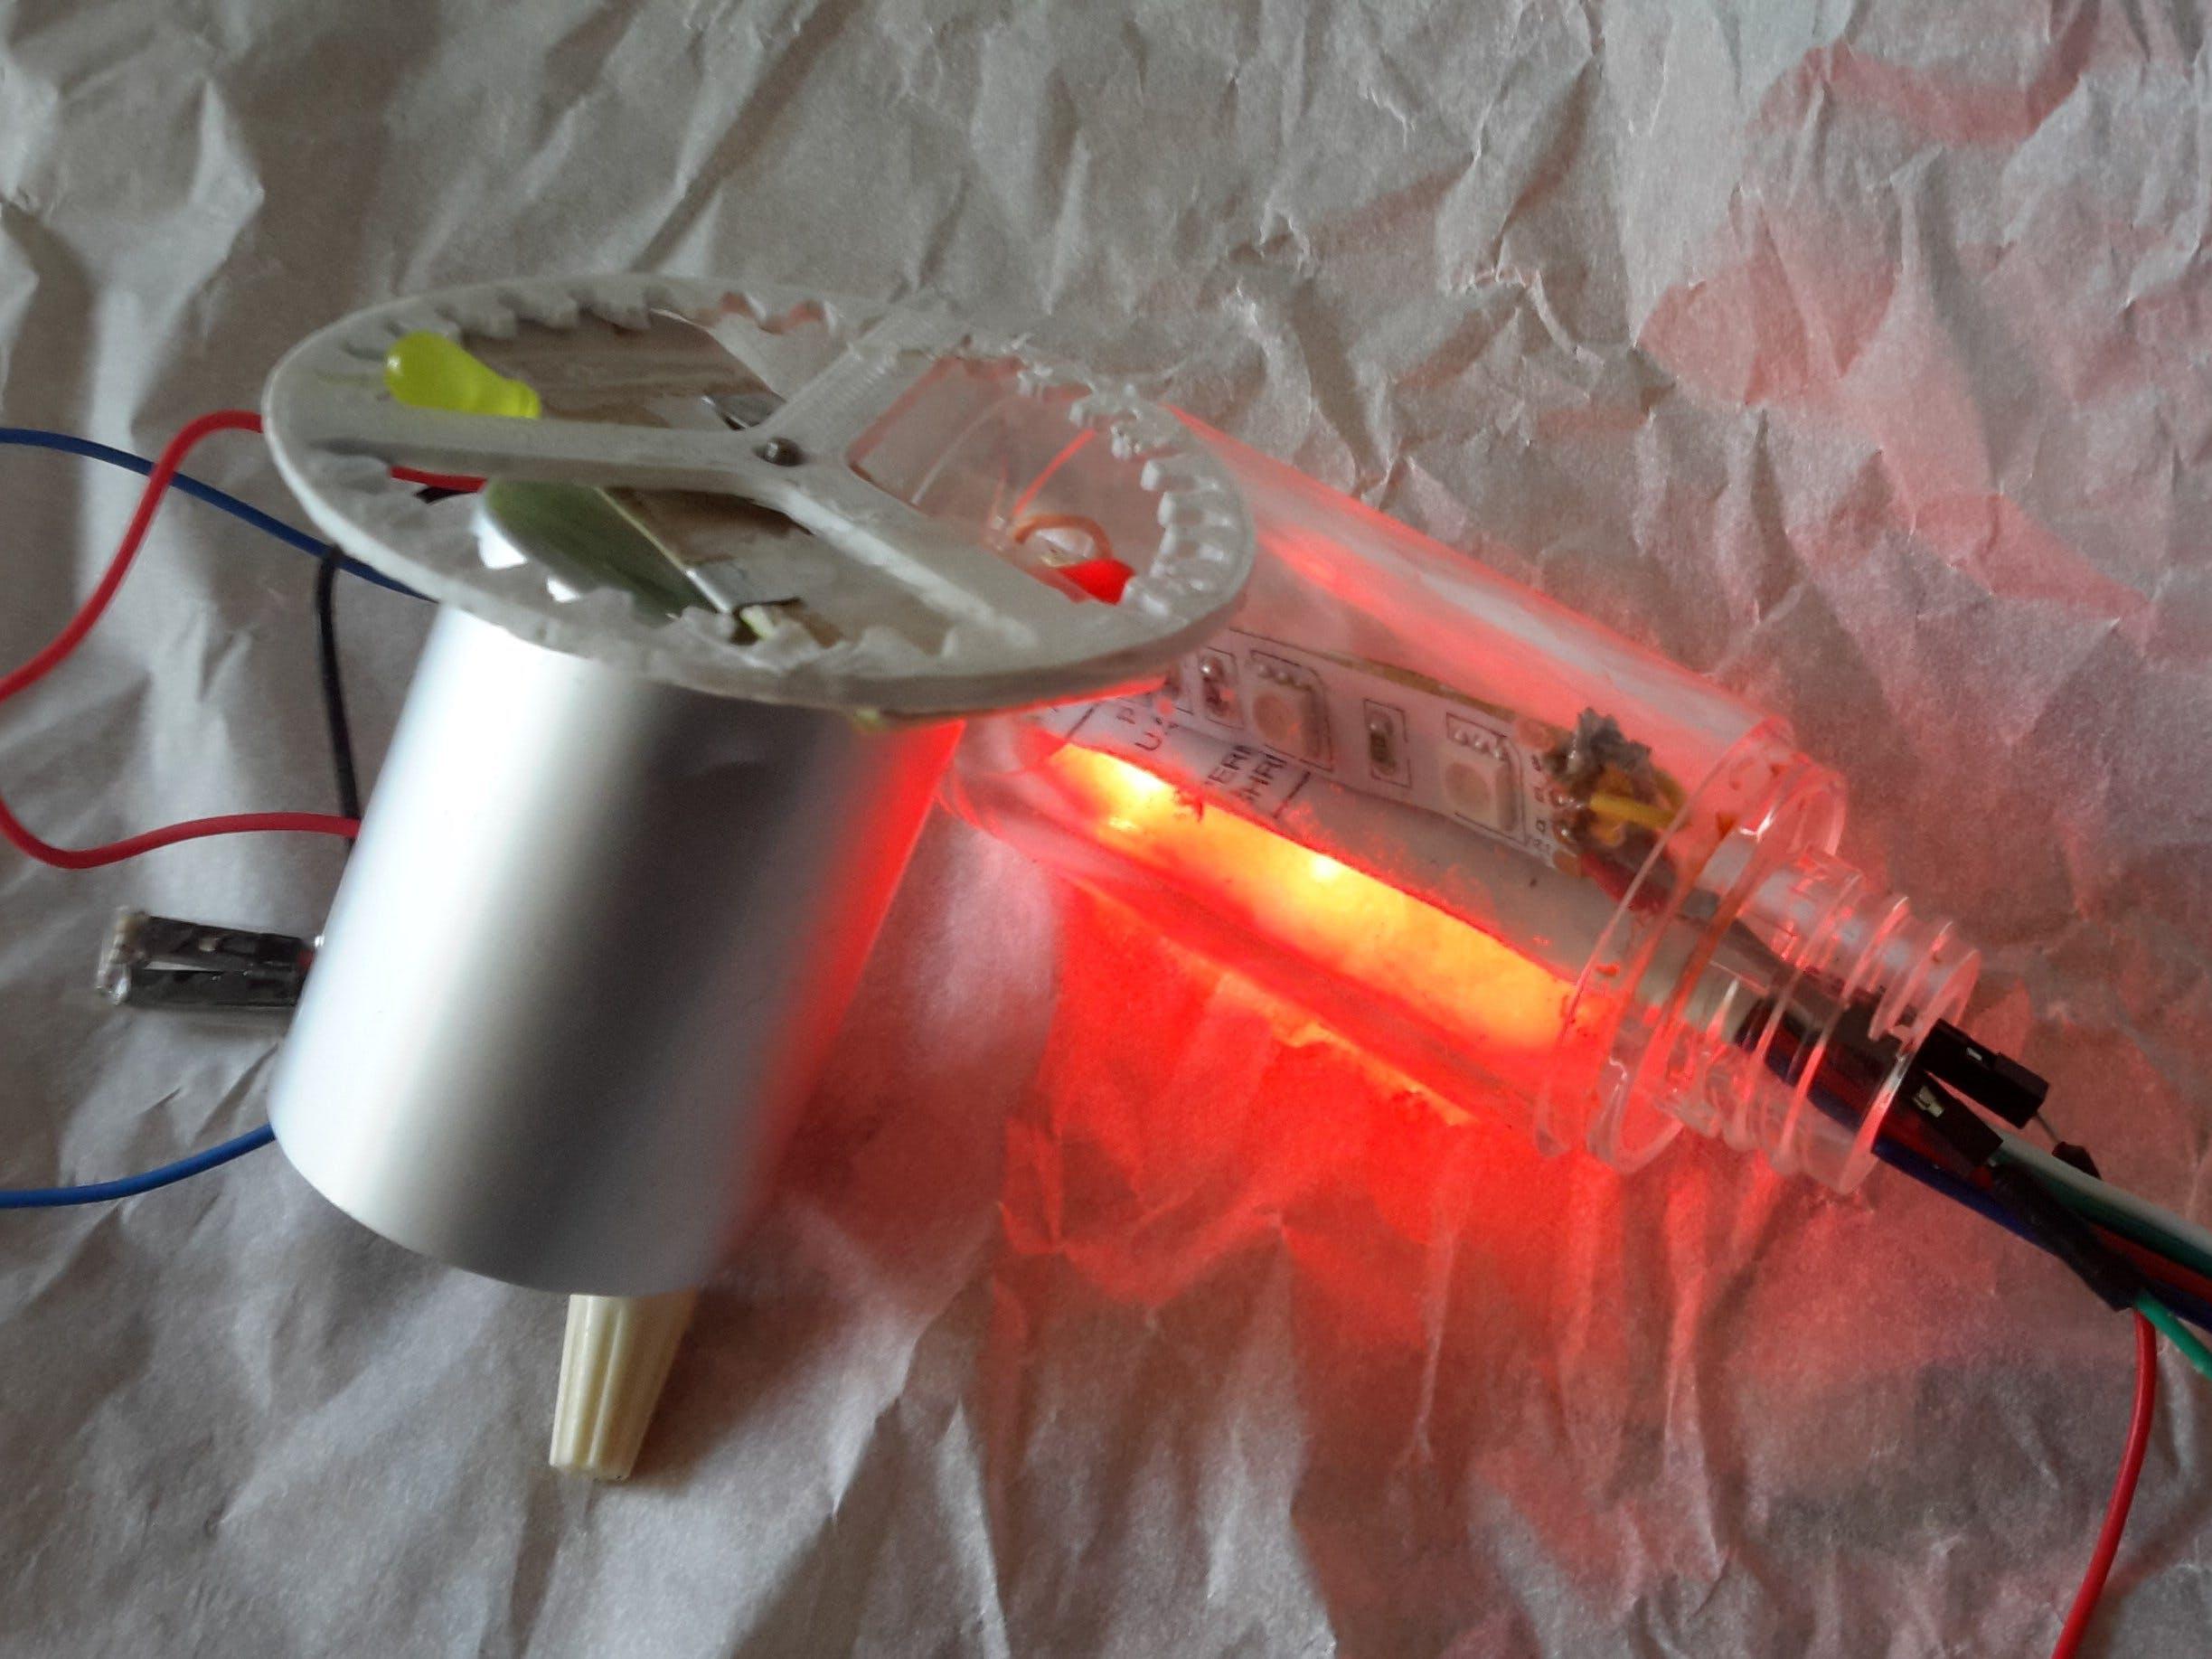 Tilt Activated Spinning Fan Light Stick